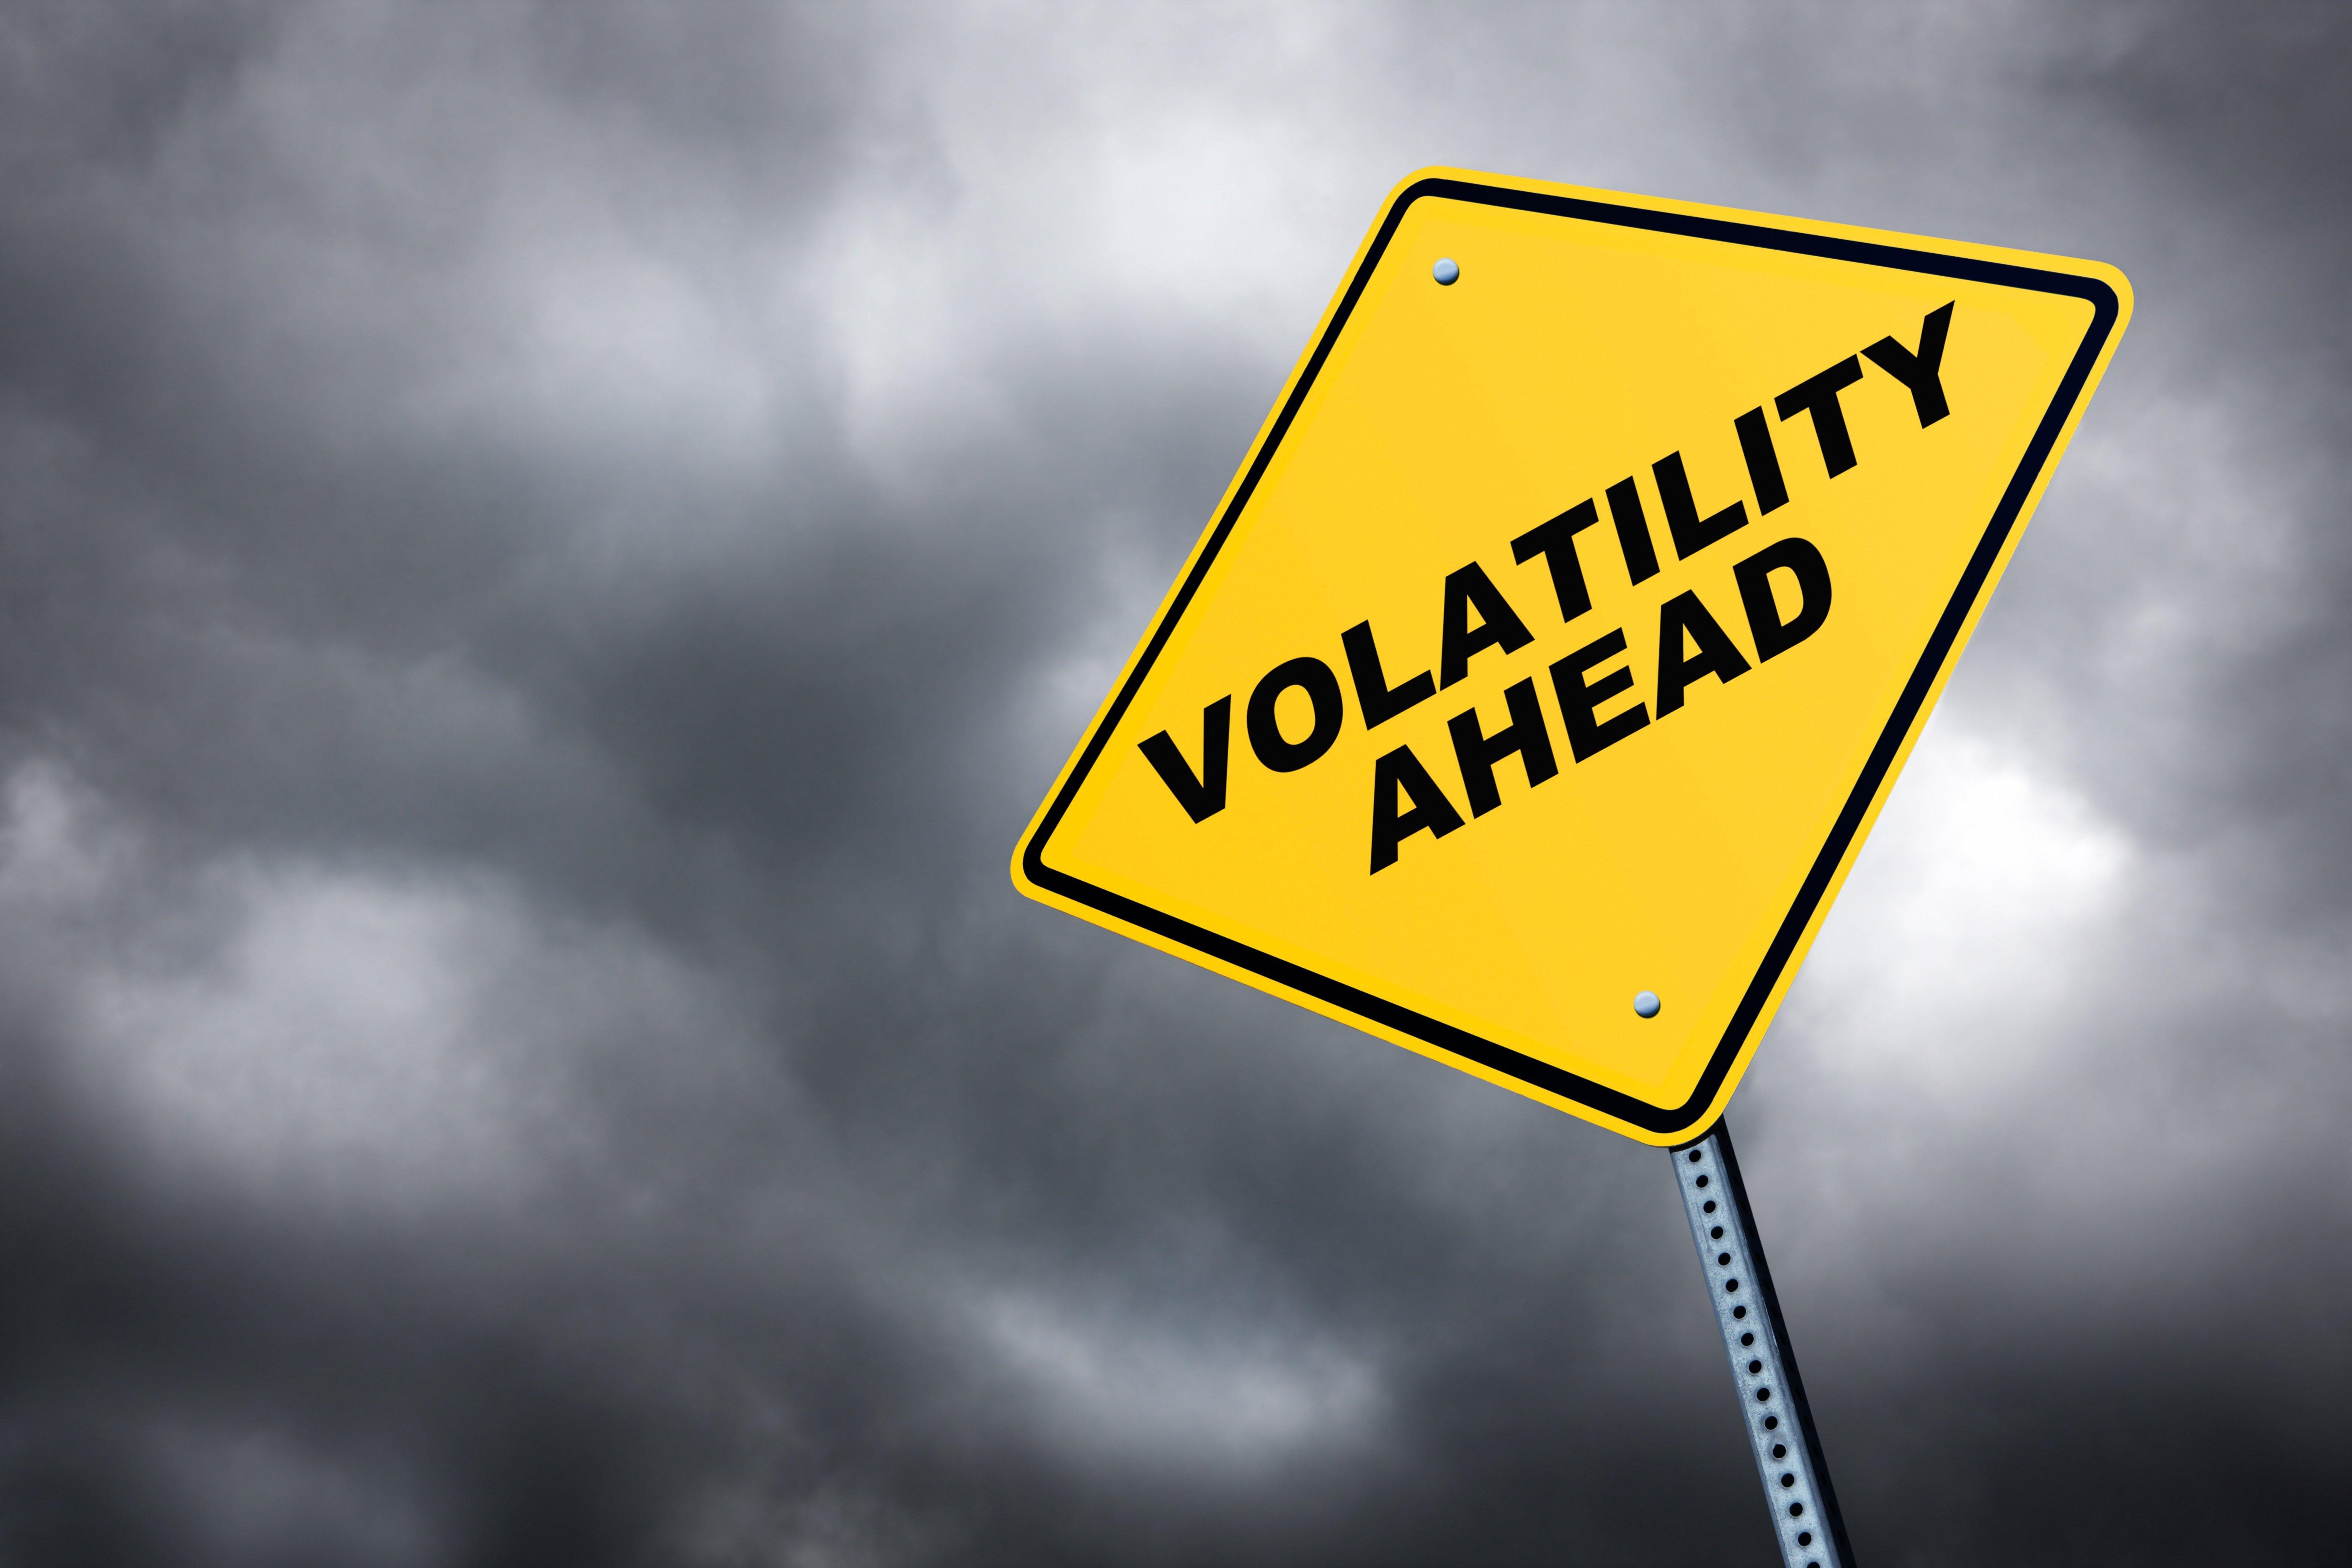 Volatility_Ahead.jpg